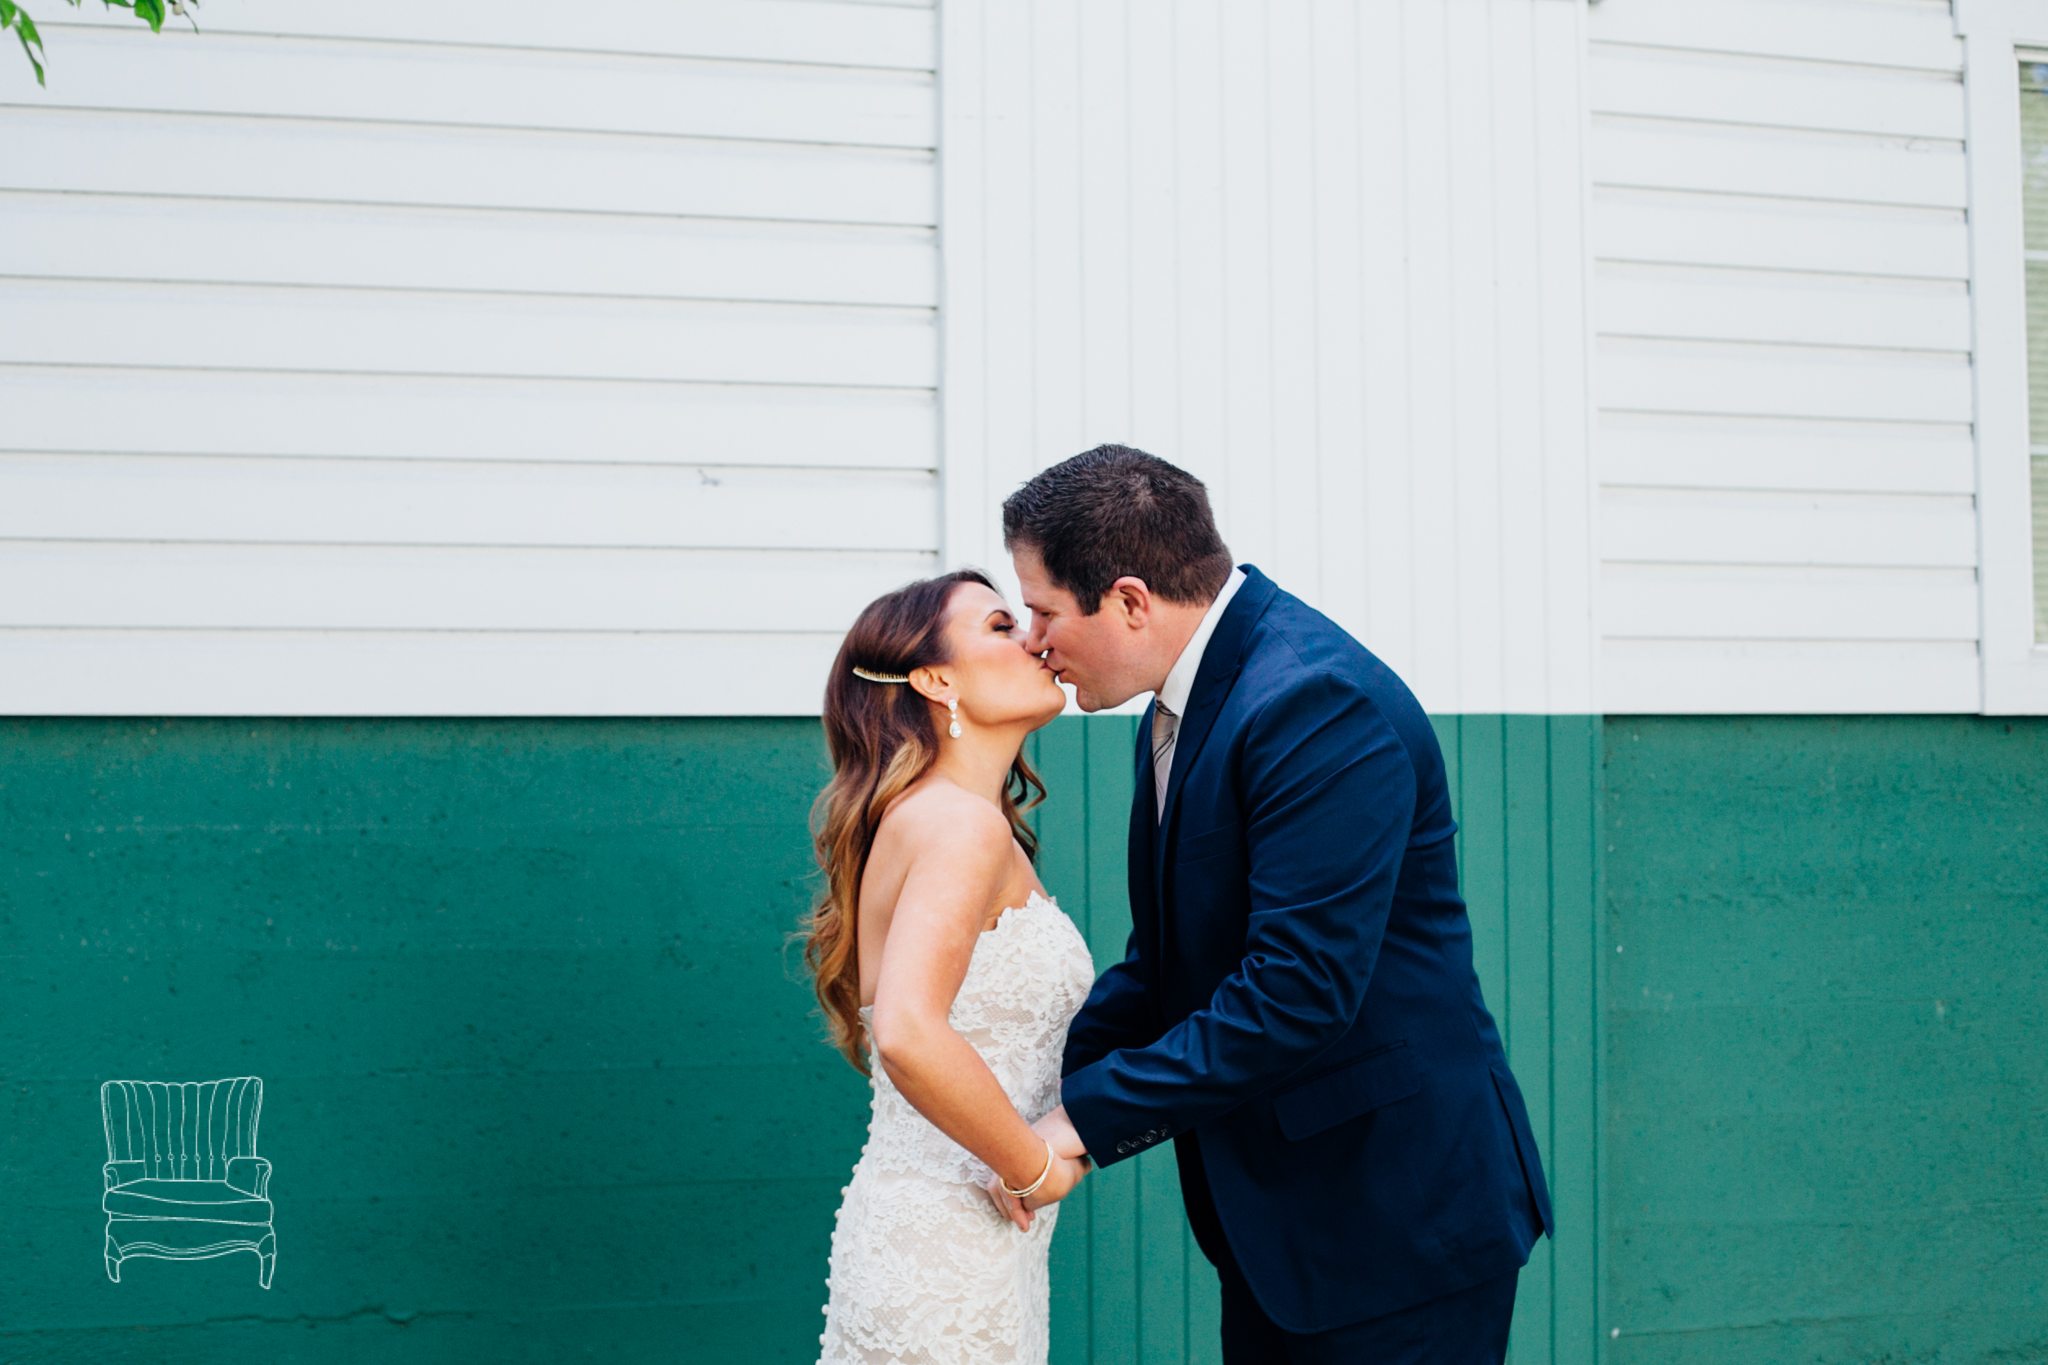 seattle-wedding-photographer-katheryn-moran-russells-bothell-wilkins-wedding-photo-16.jpg